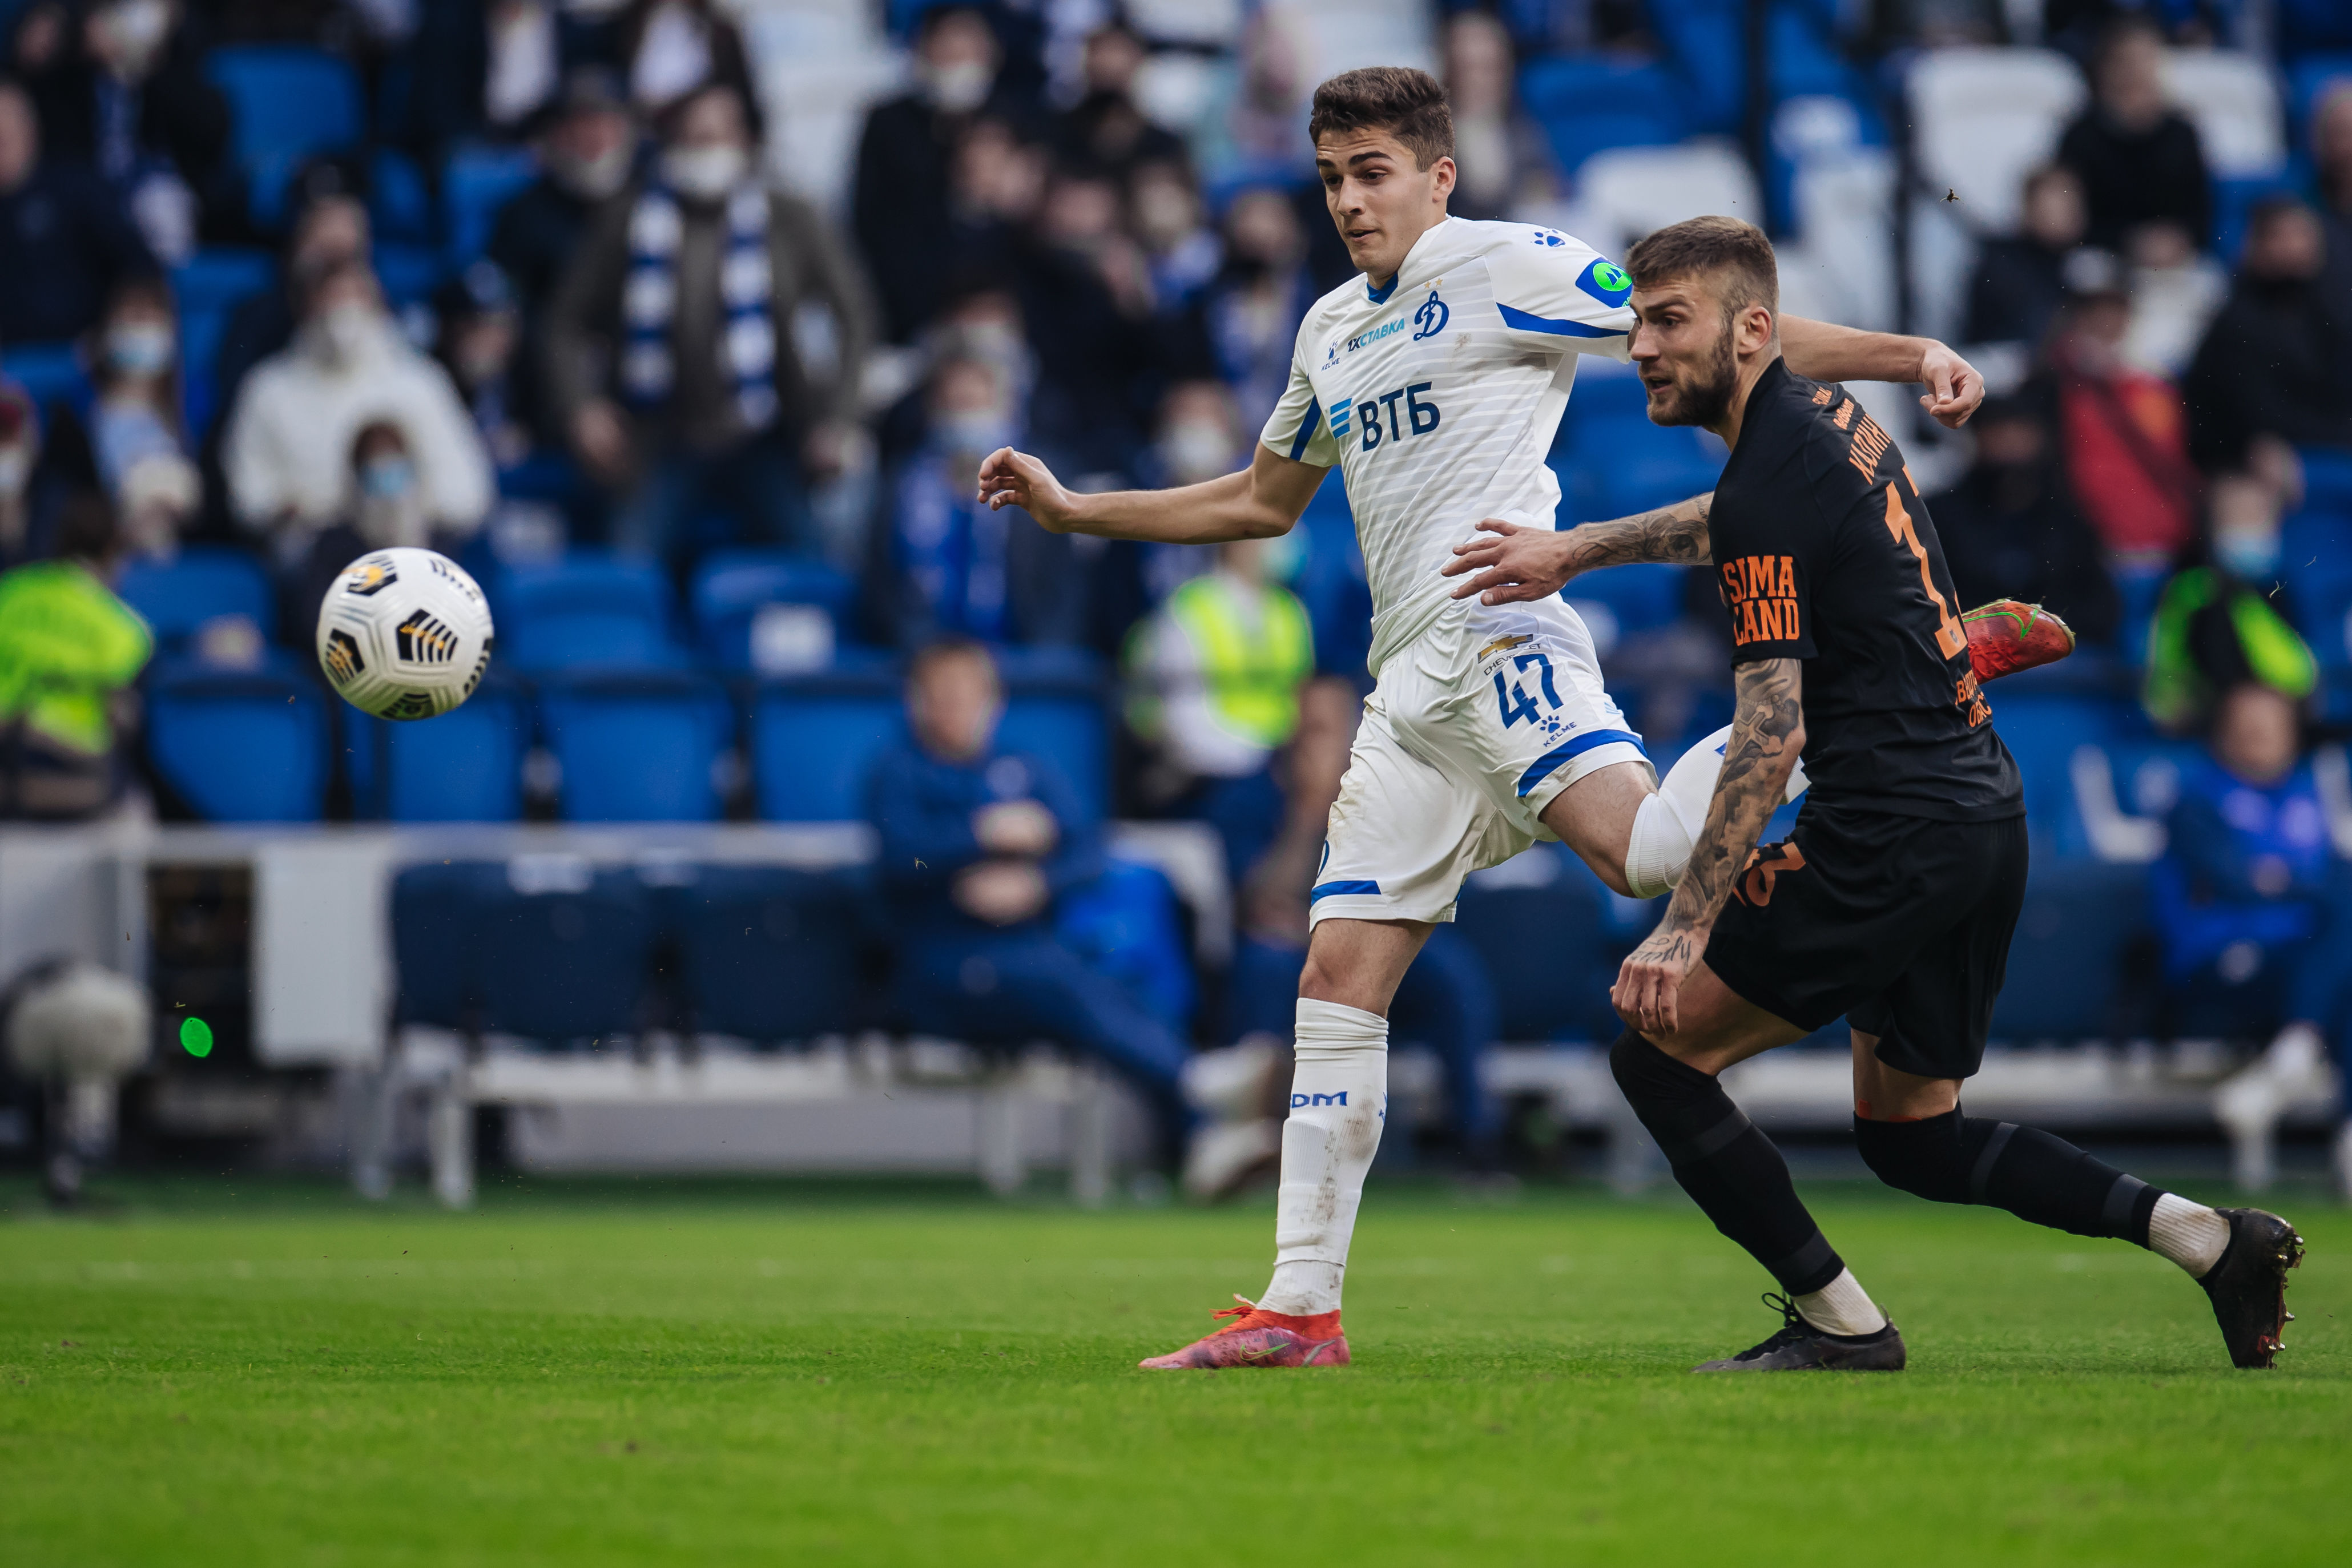 Мяч Захаряна в ворота «Урала» признан ВТБ голом месяца в апреле